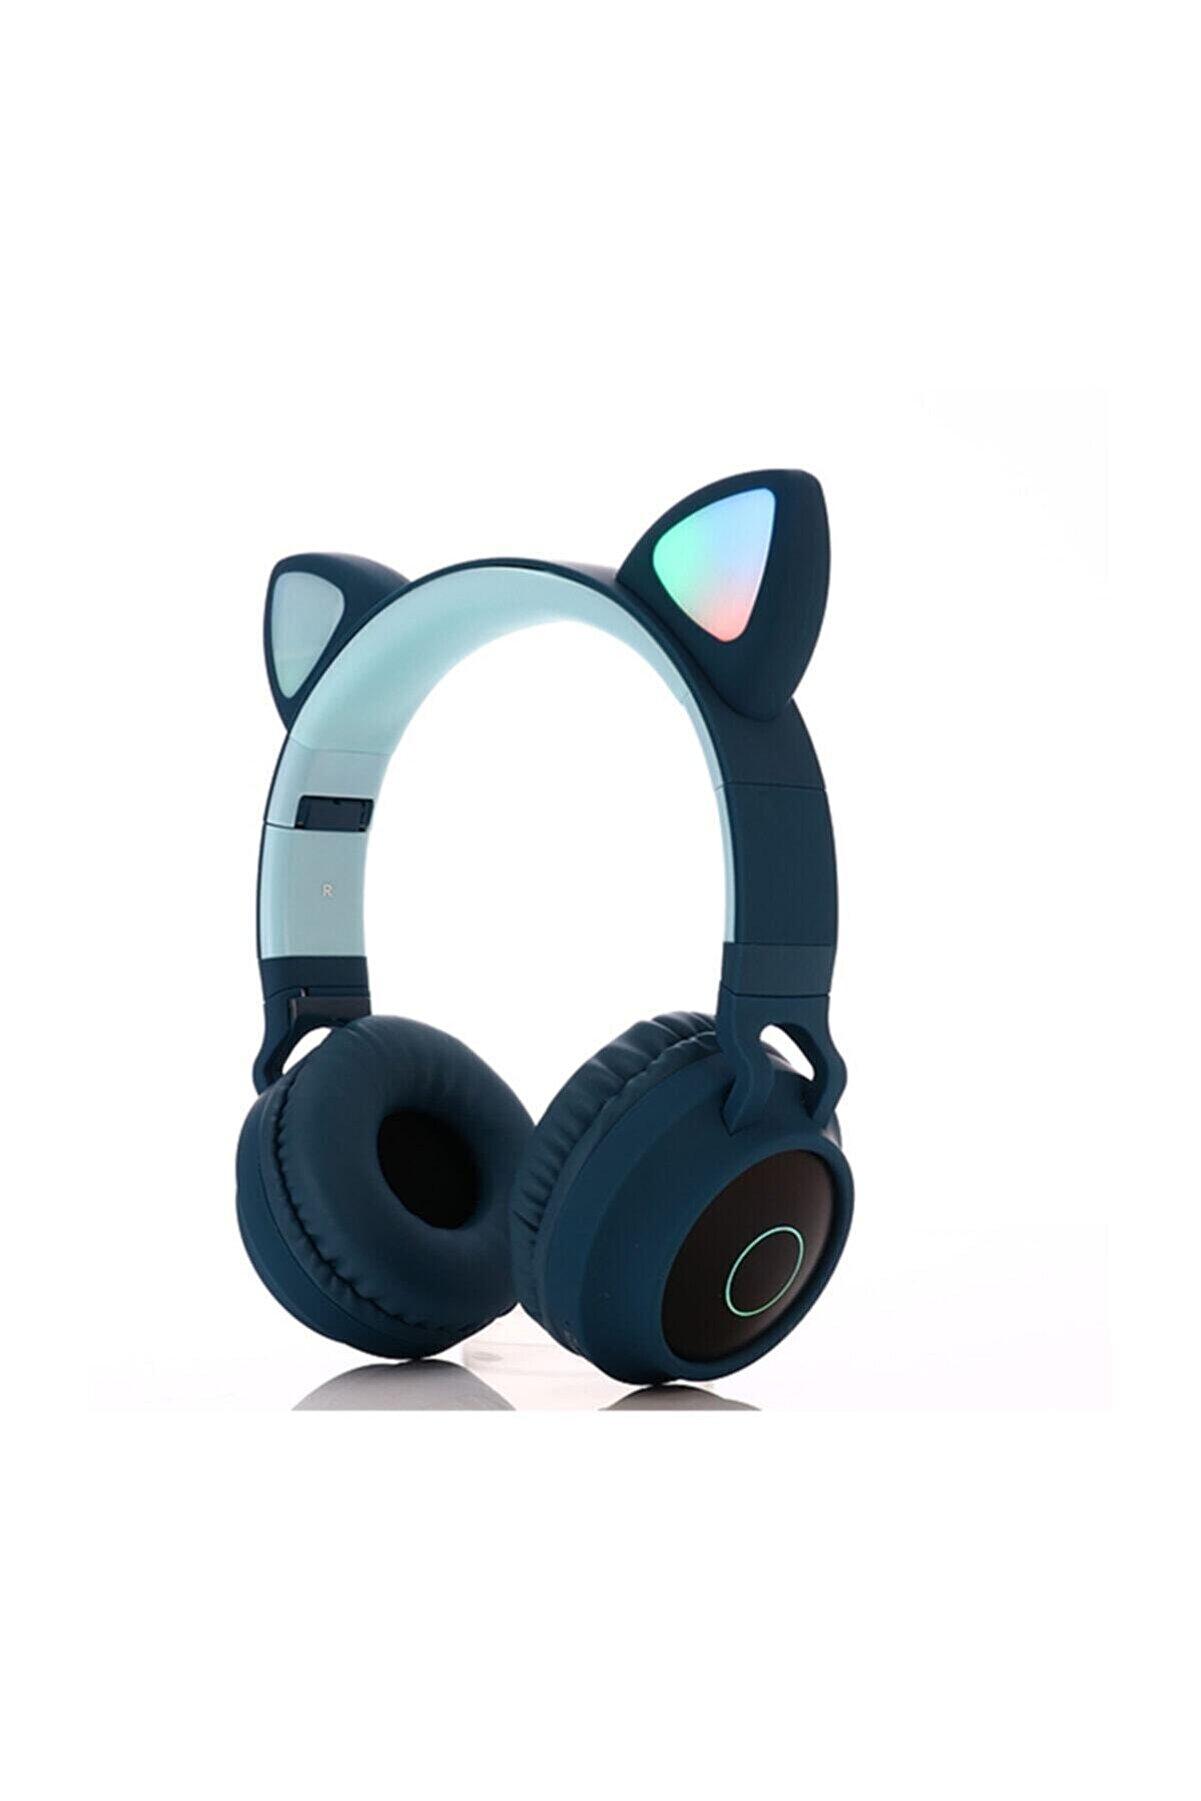 T G T&G-BT028C Kablosuz Bluetooth 5.0 Stereo Yüksek Ses Akıllı LED Kulaklık